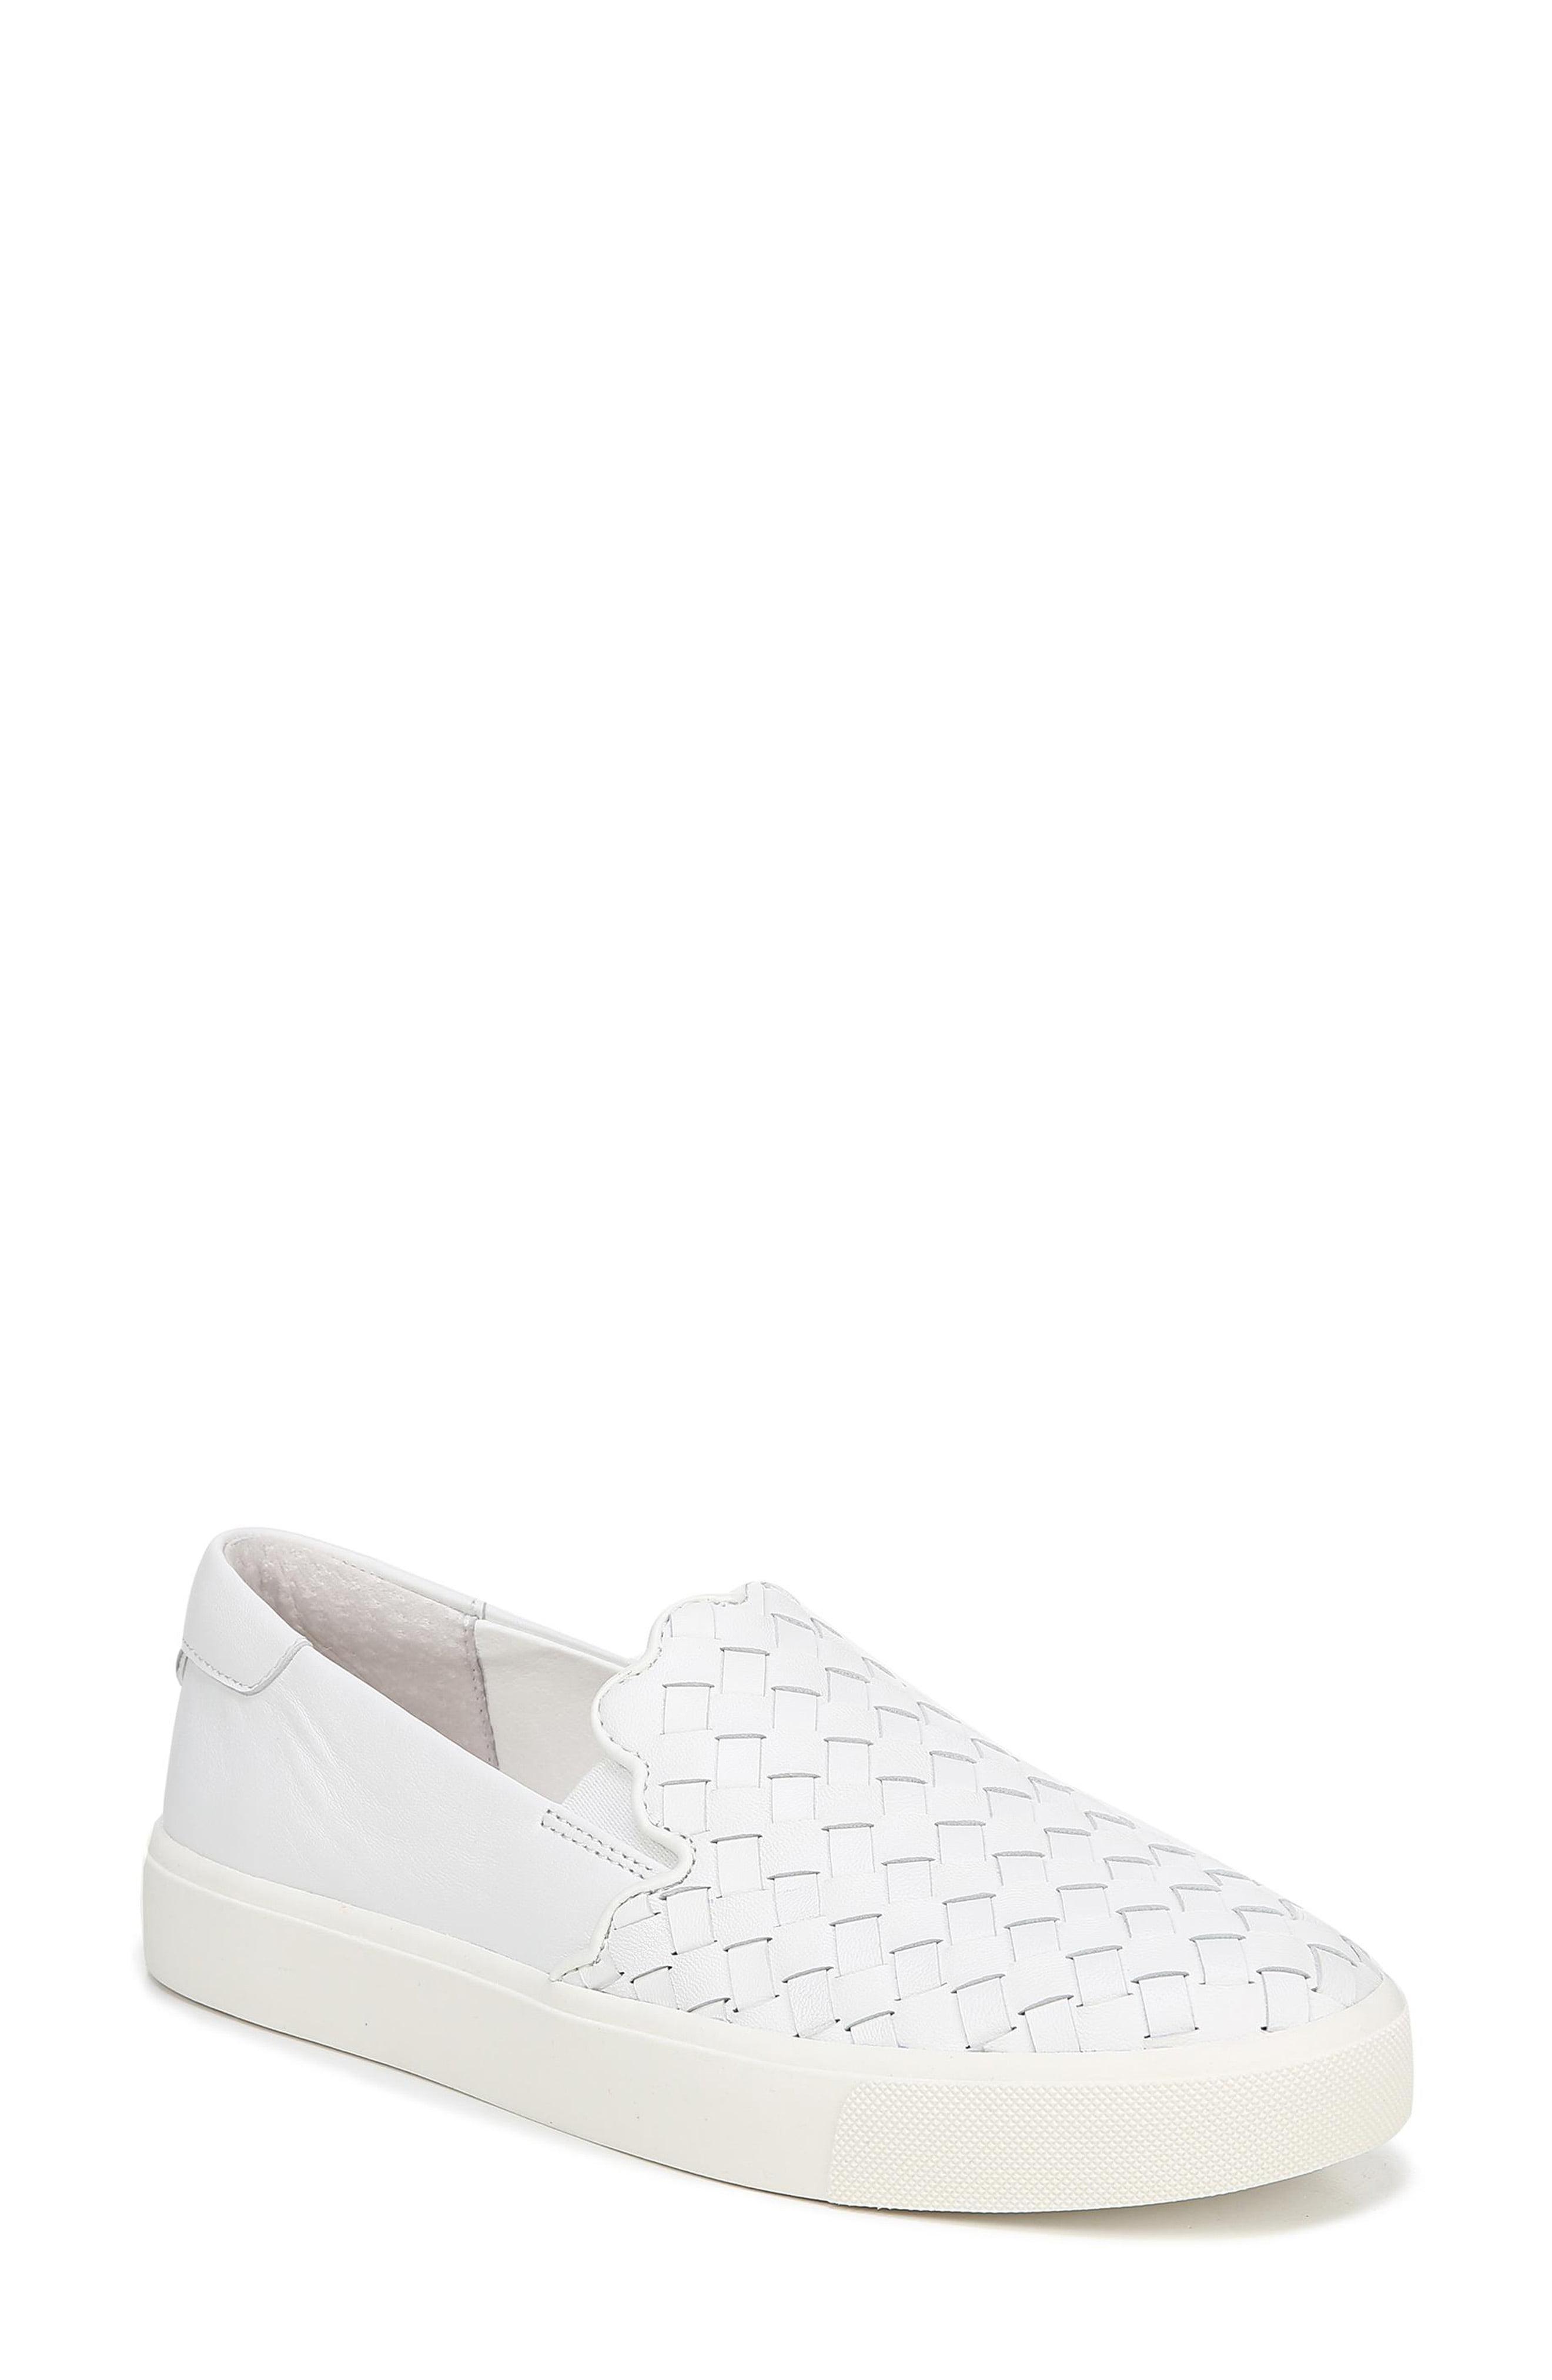 Sam Edelman Leather Eda Sneaker in